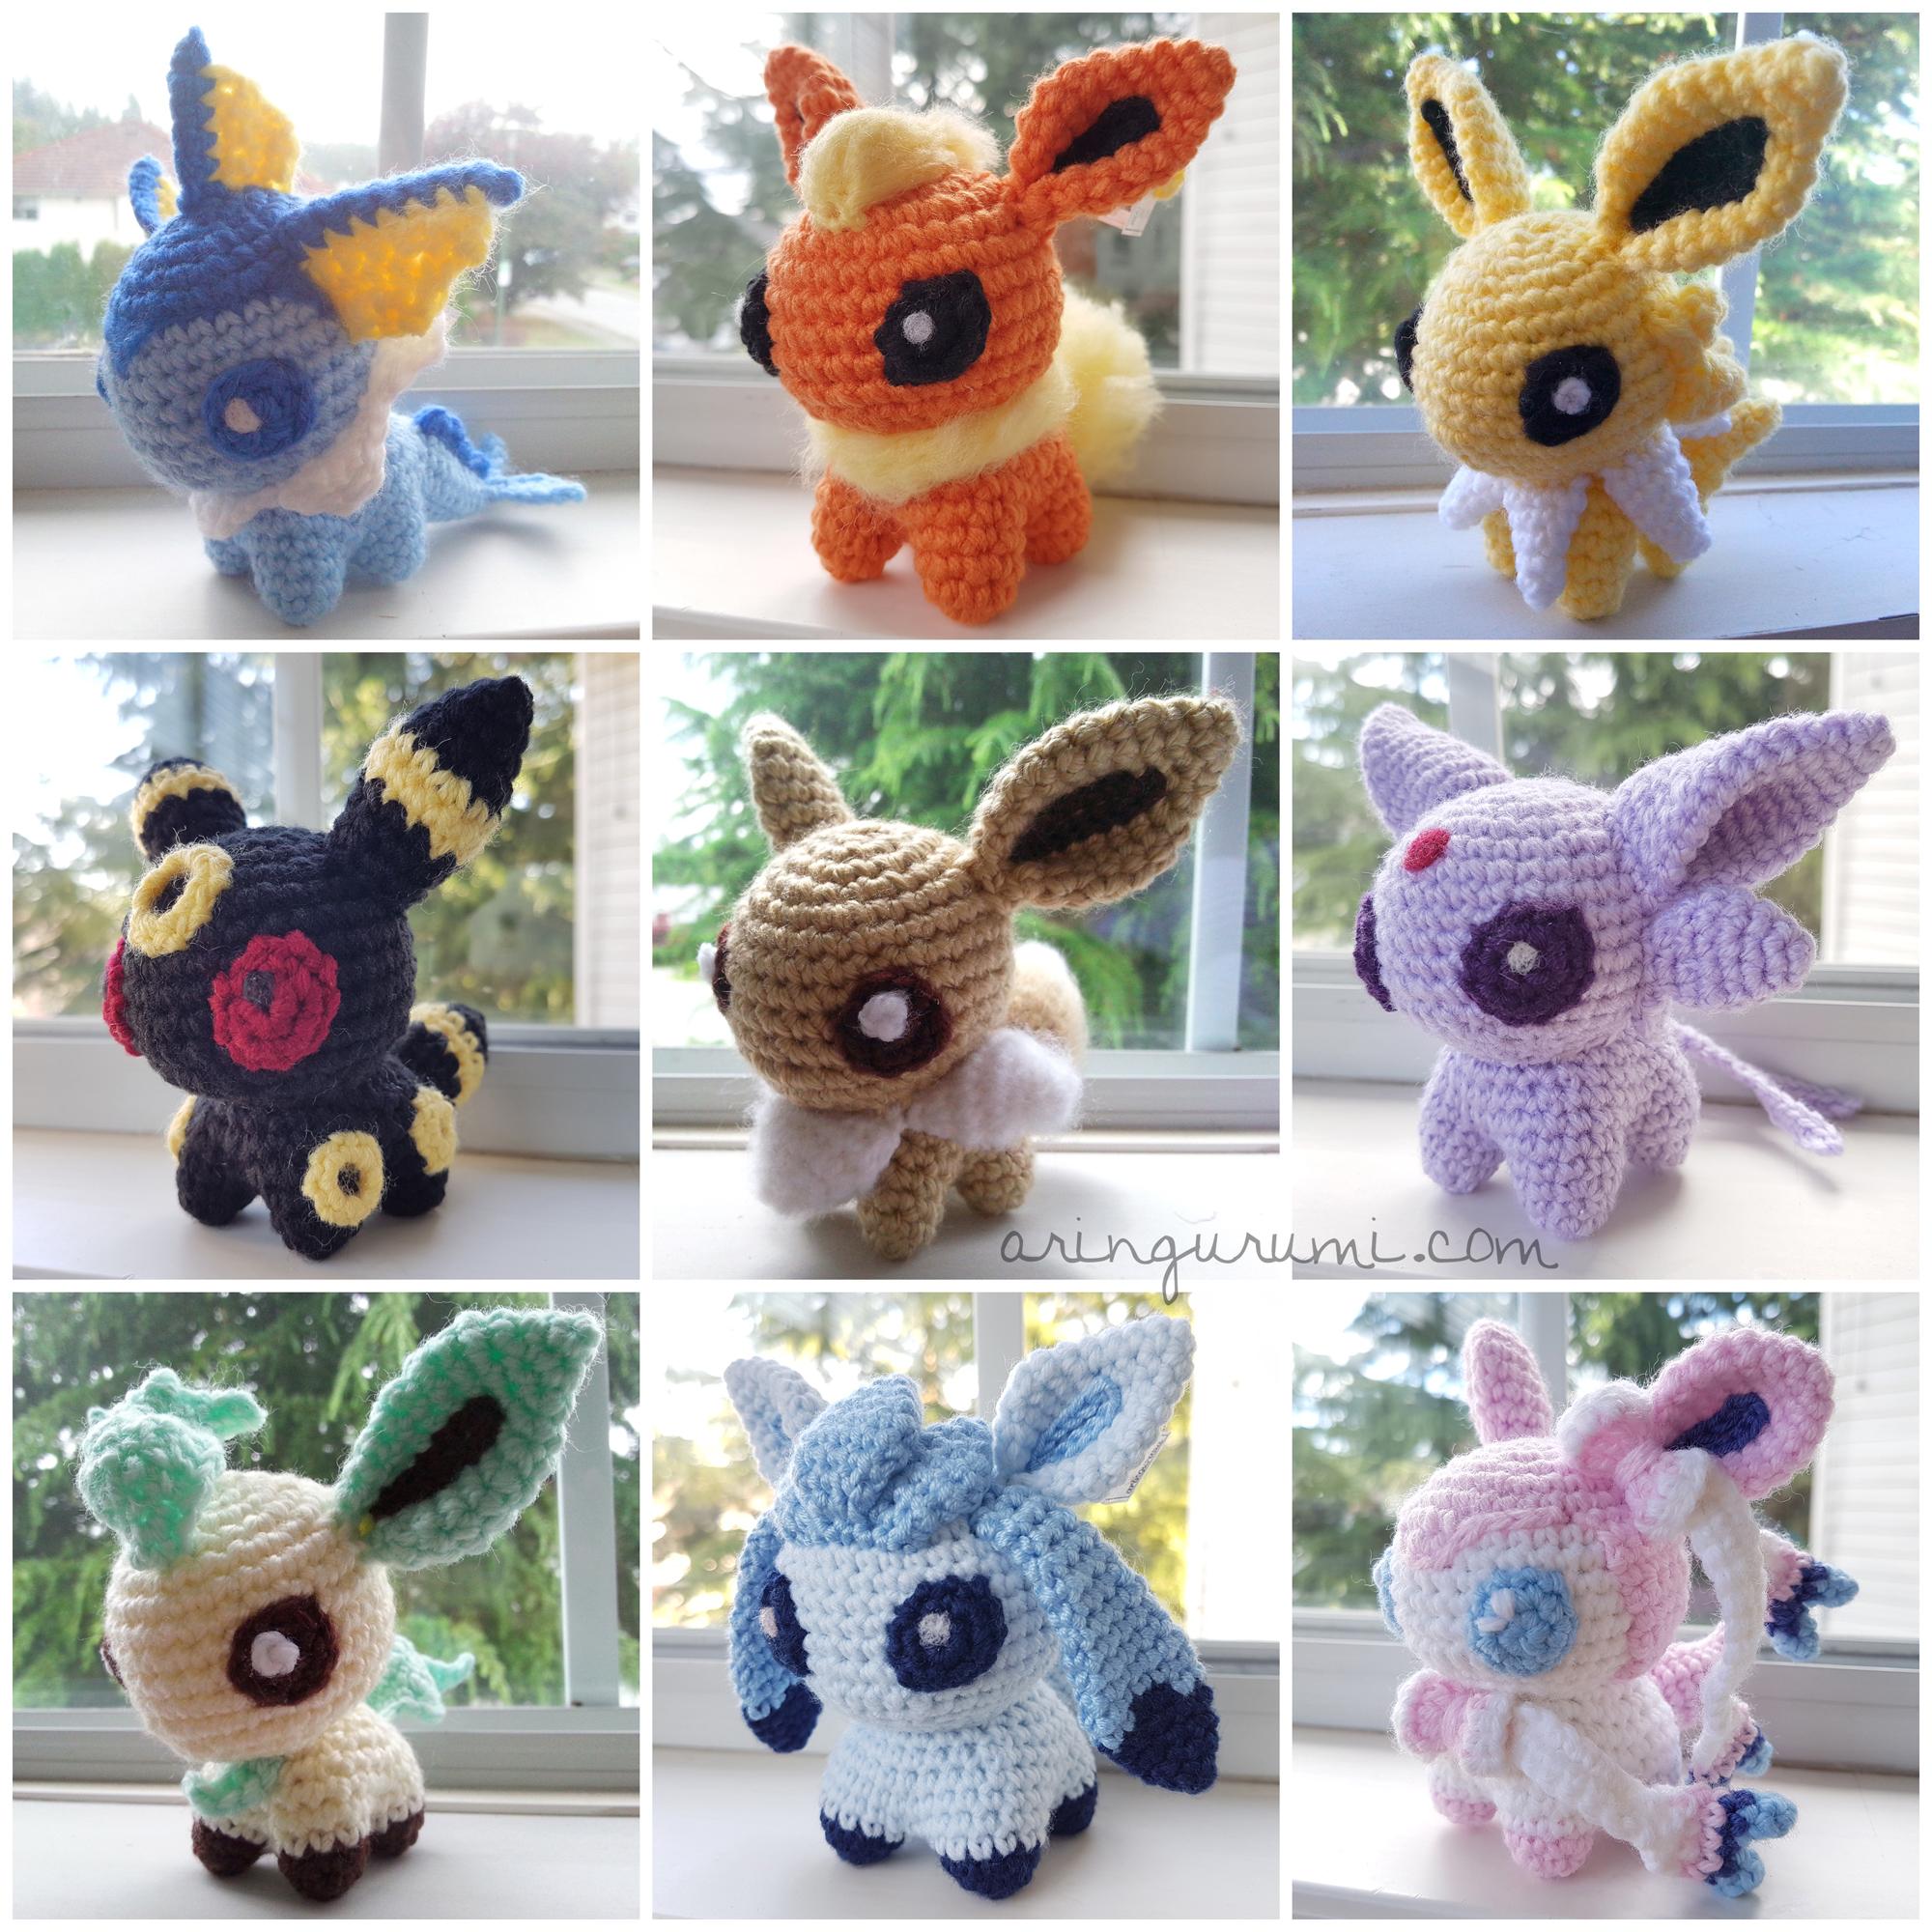 2ae588e3 complete set of 9 eeveelution amigurumi - crochet plush eevee flareon ...